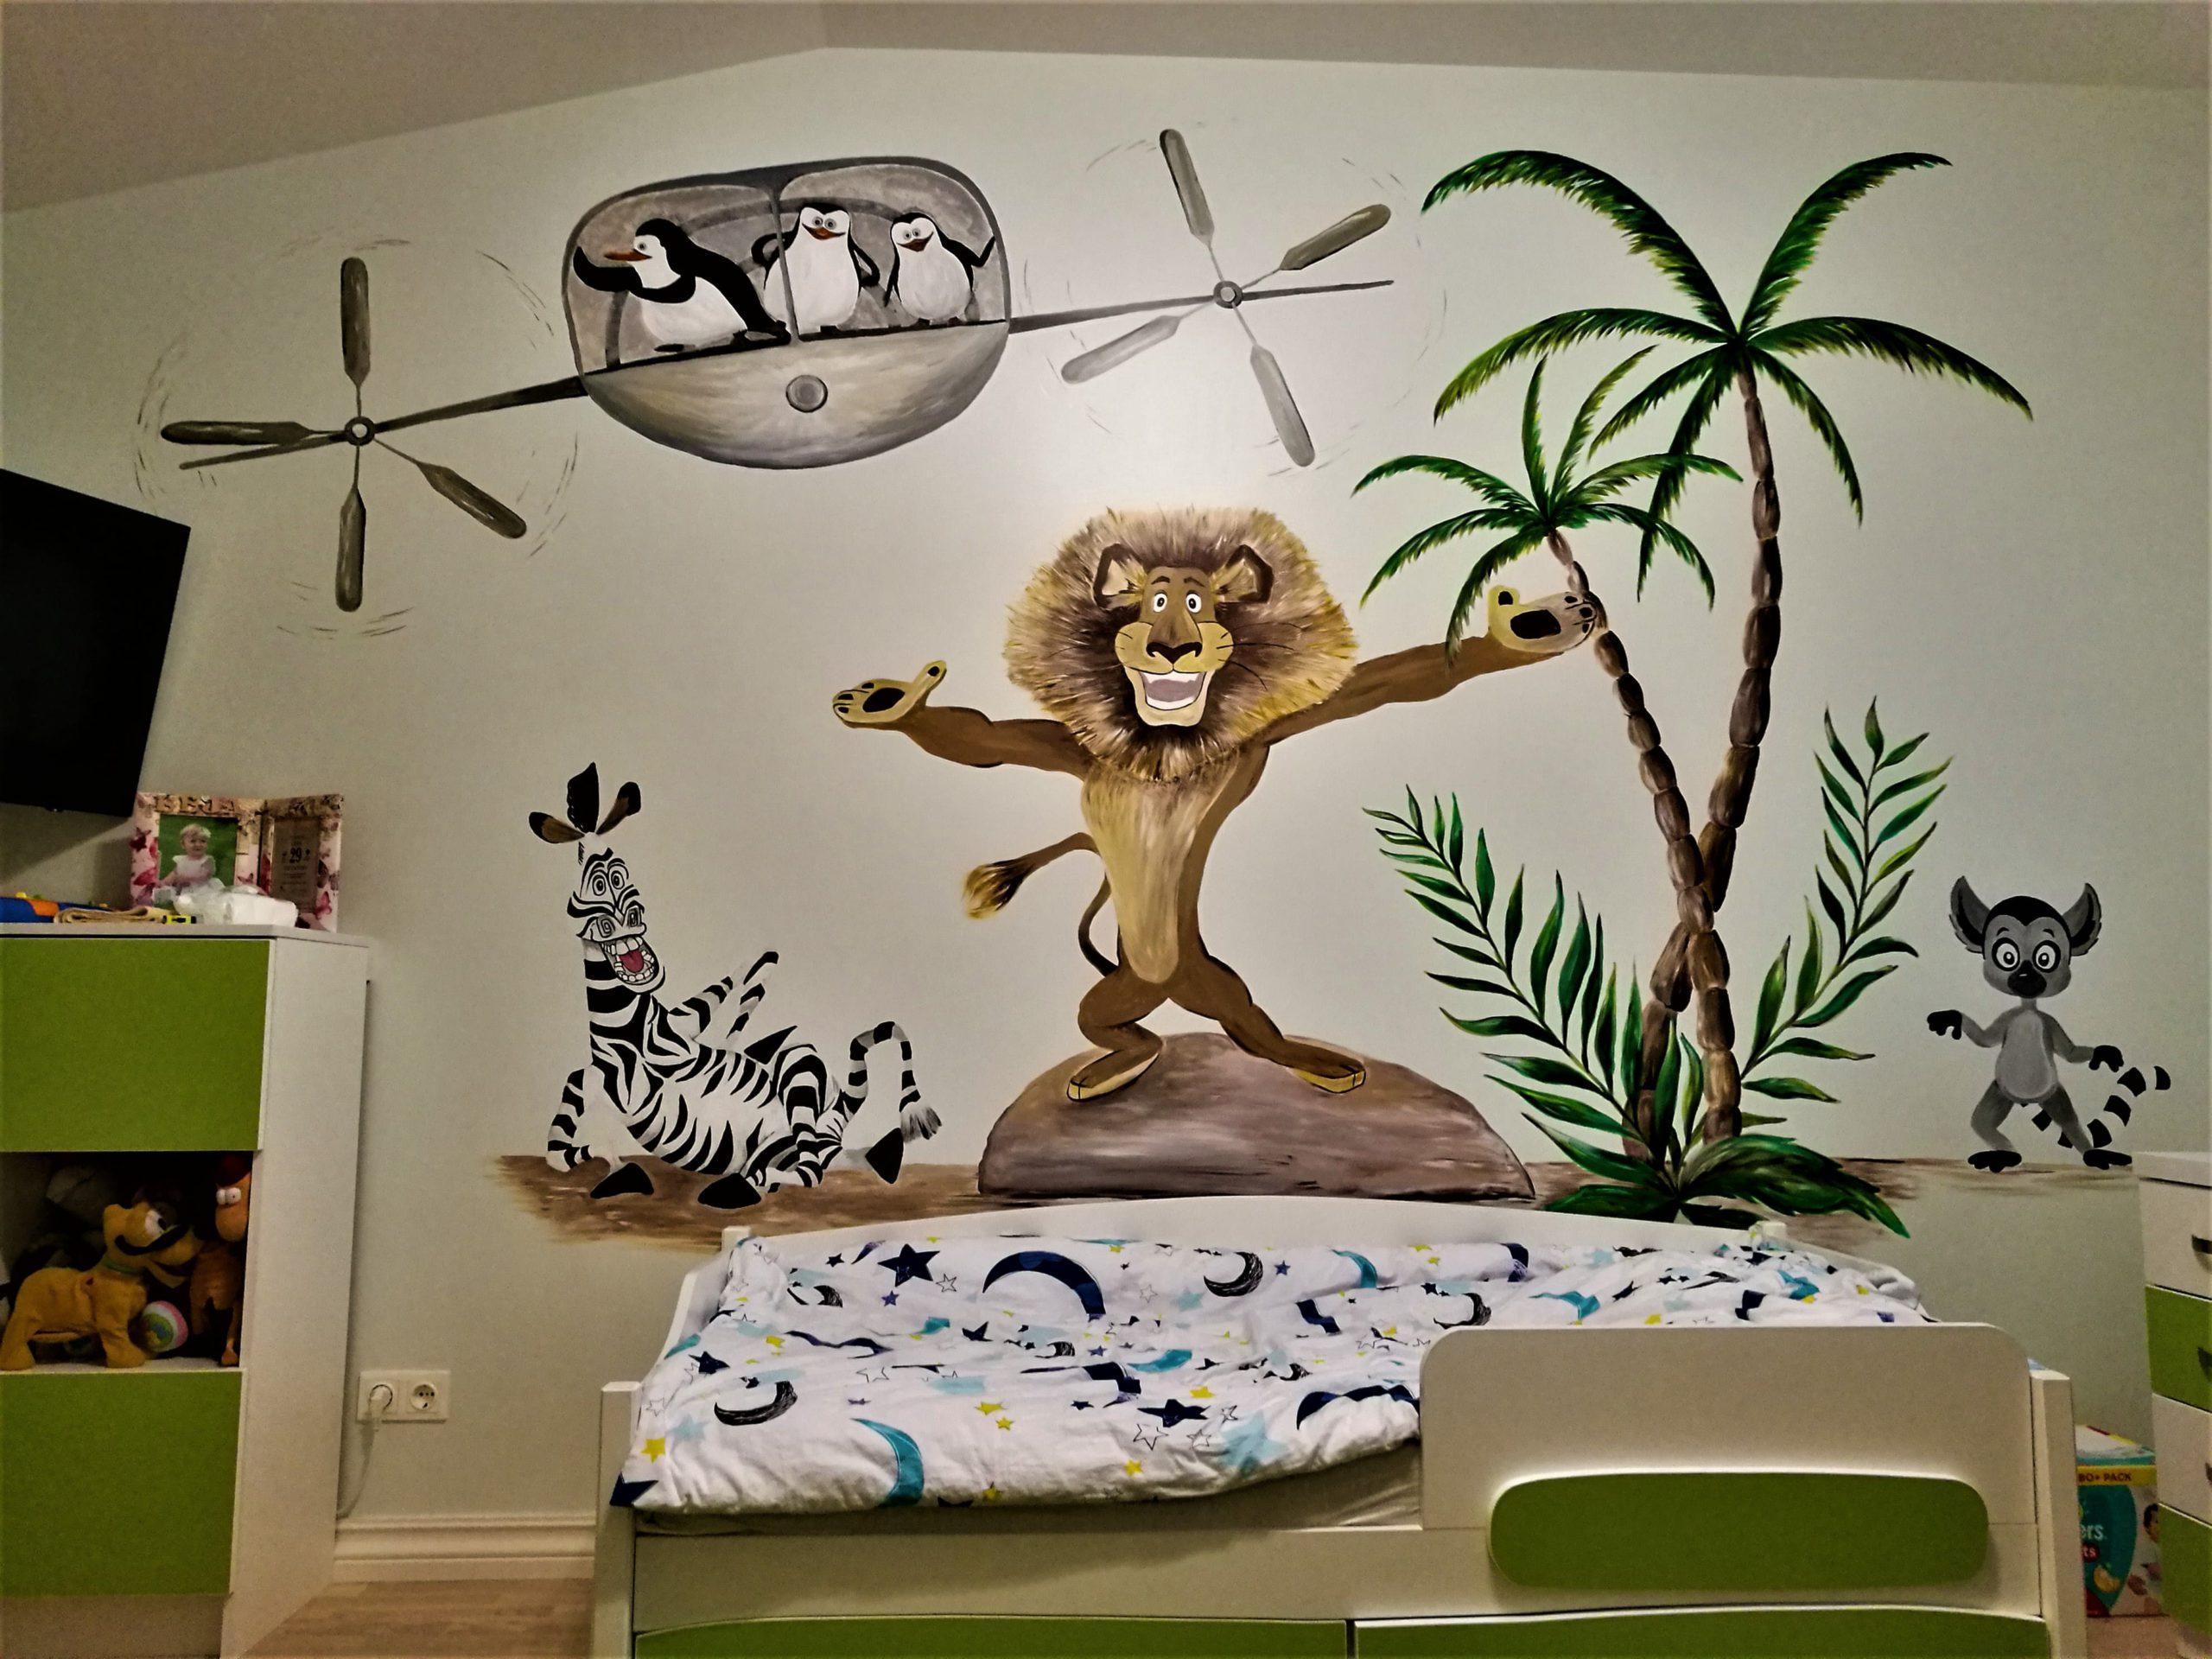 menine-kuryba-sienu-dekoravimas (28)